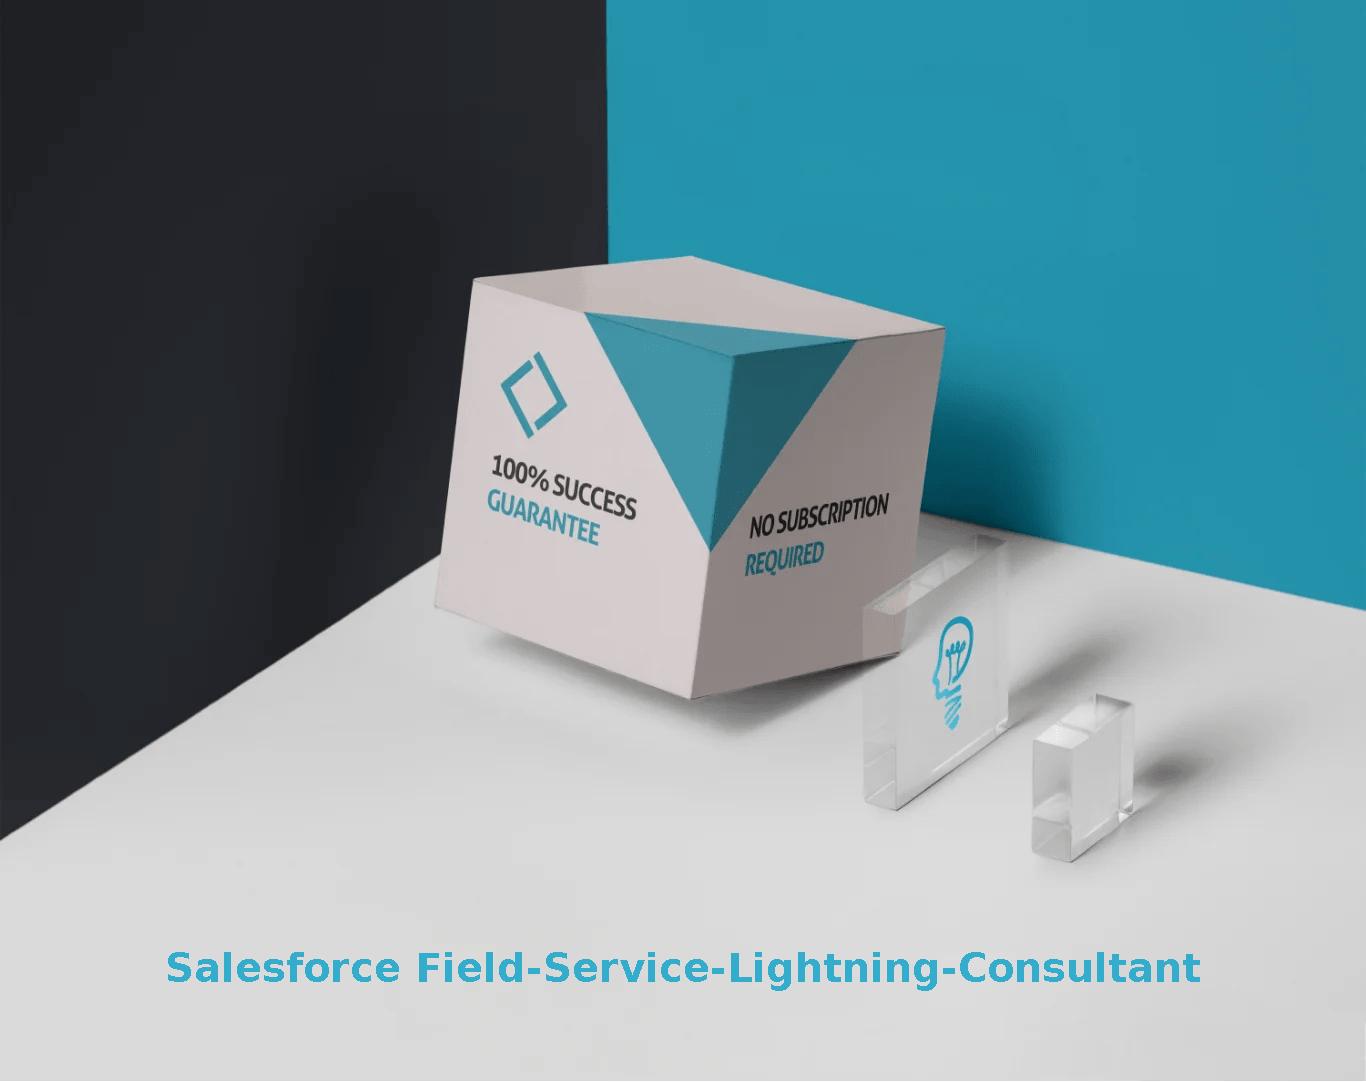 Field-Service-Lightning-Consultant Dumps